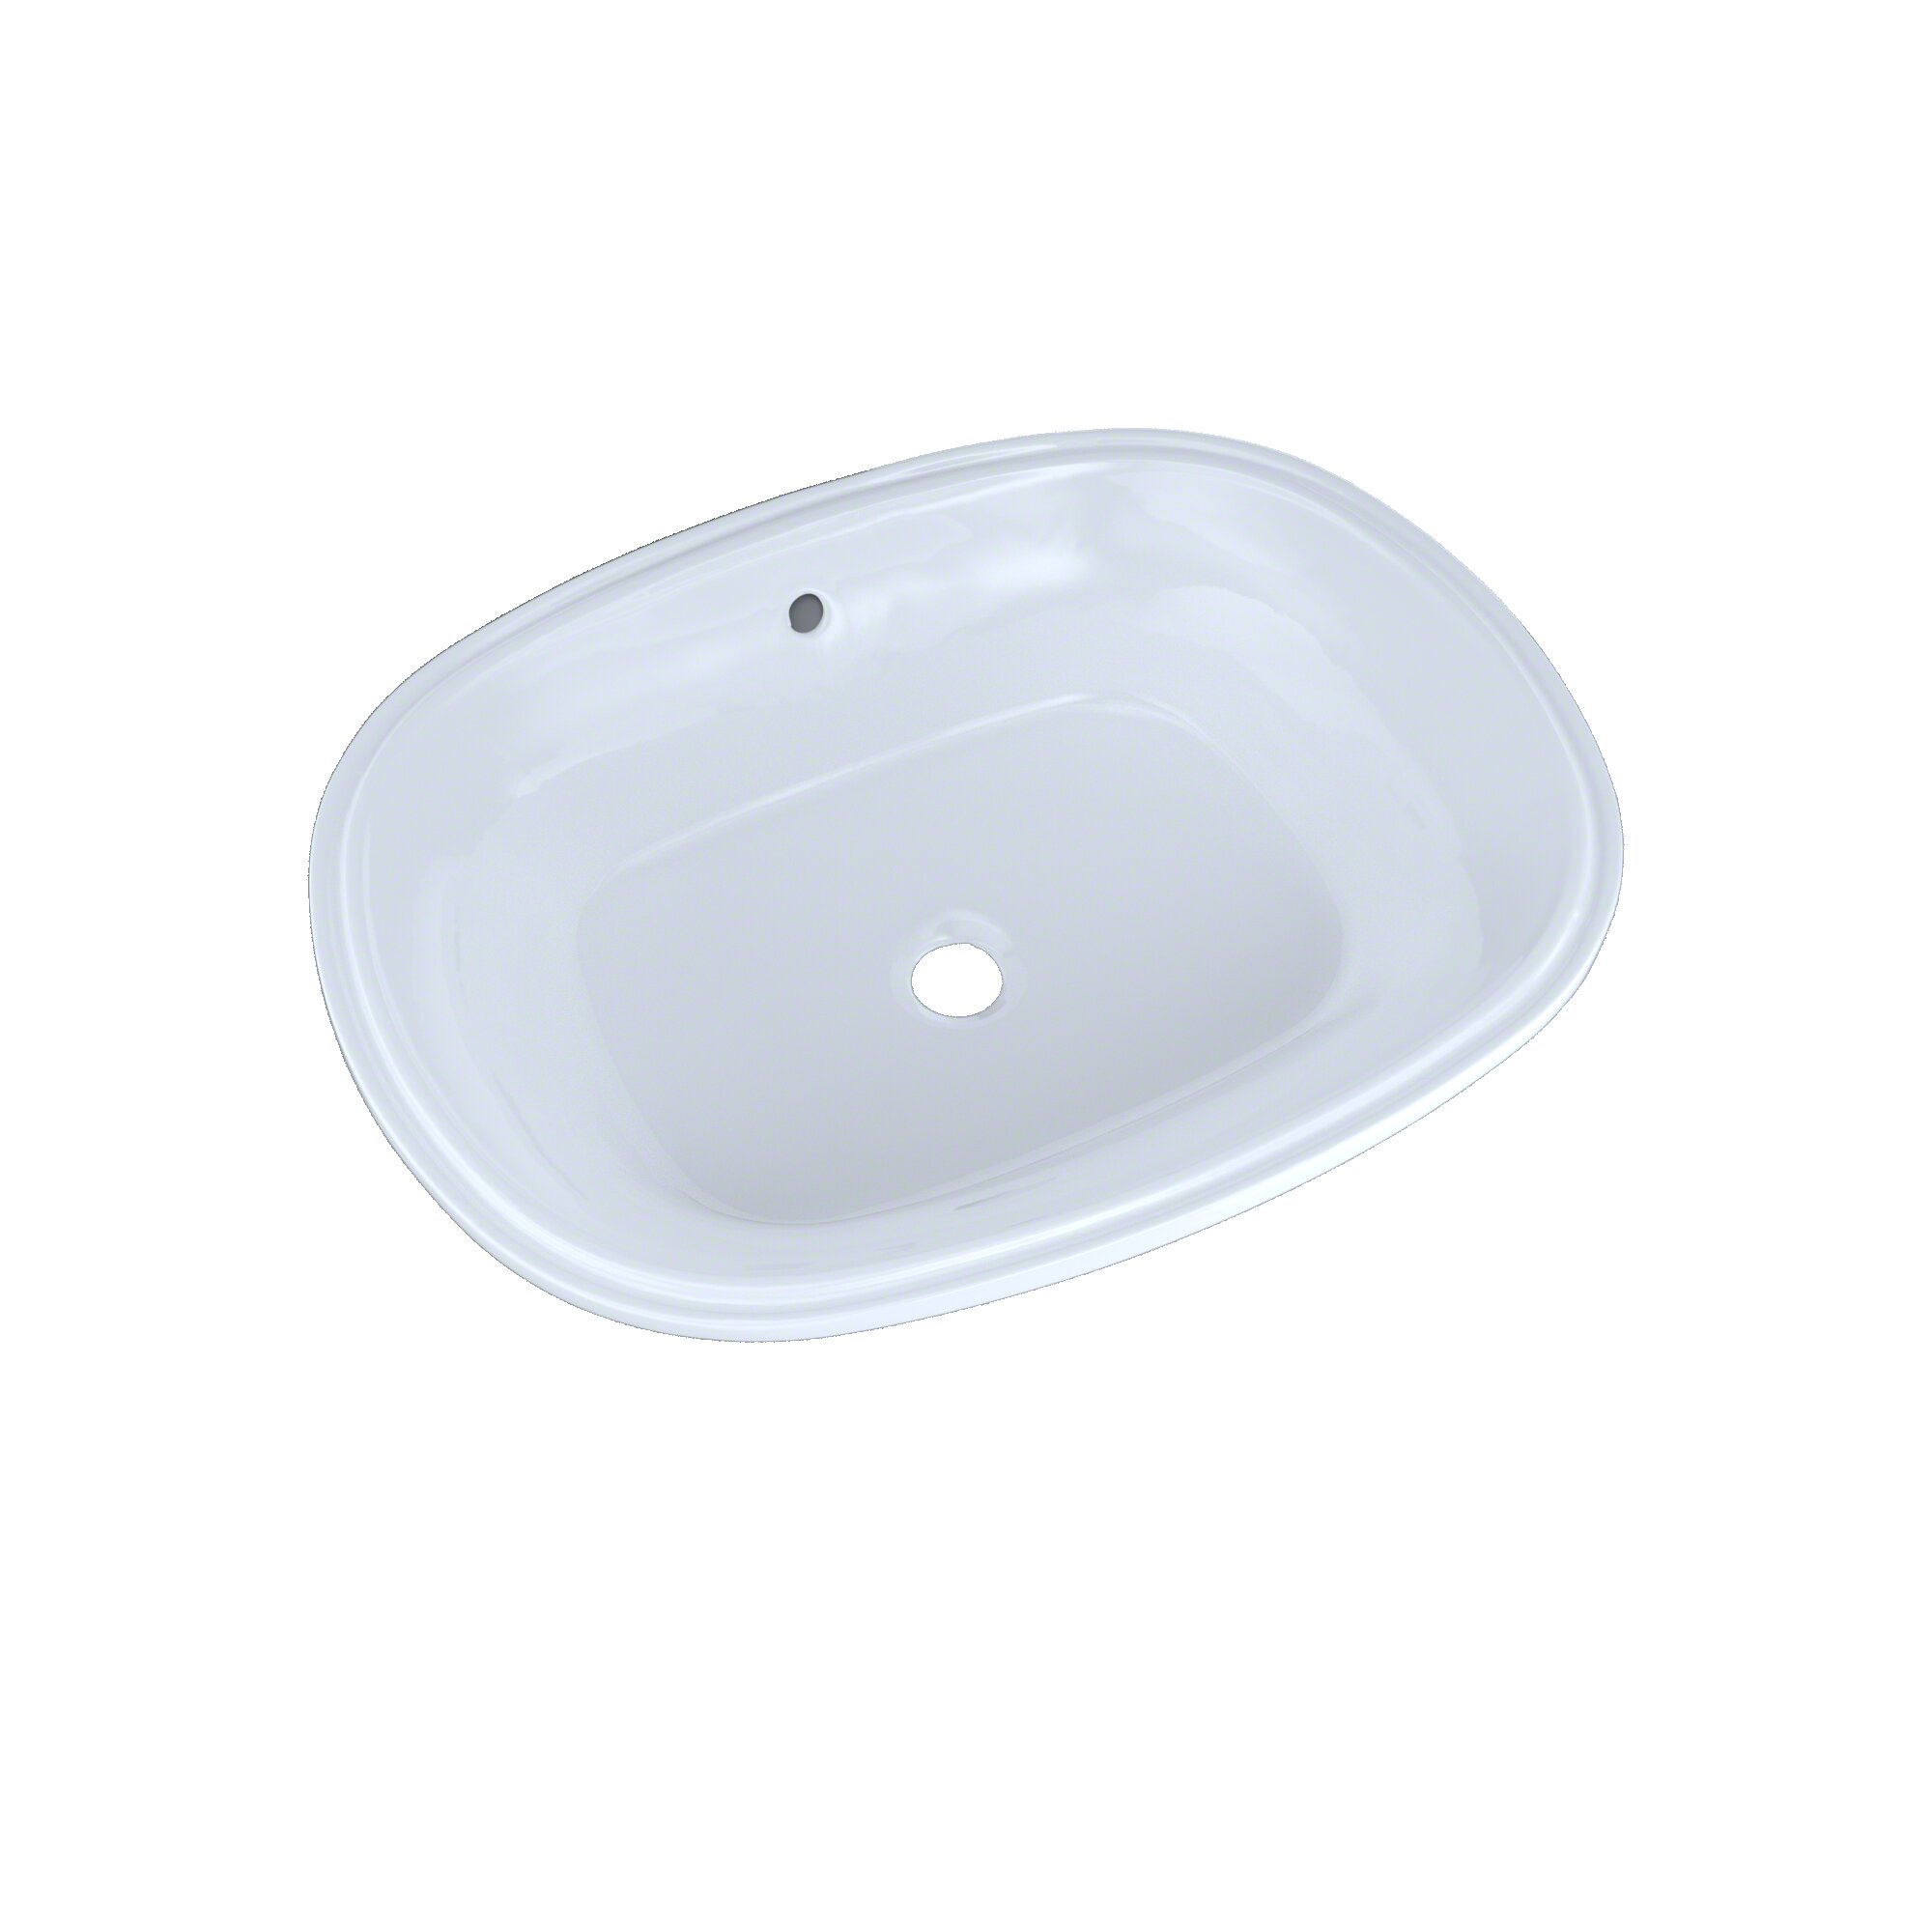 Toto Maris Vitreous China Oval Undermount Bathroom Sink With Overflow Wayfair